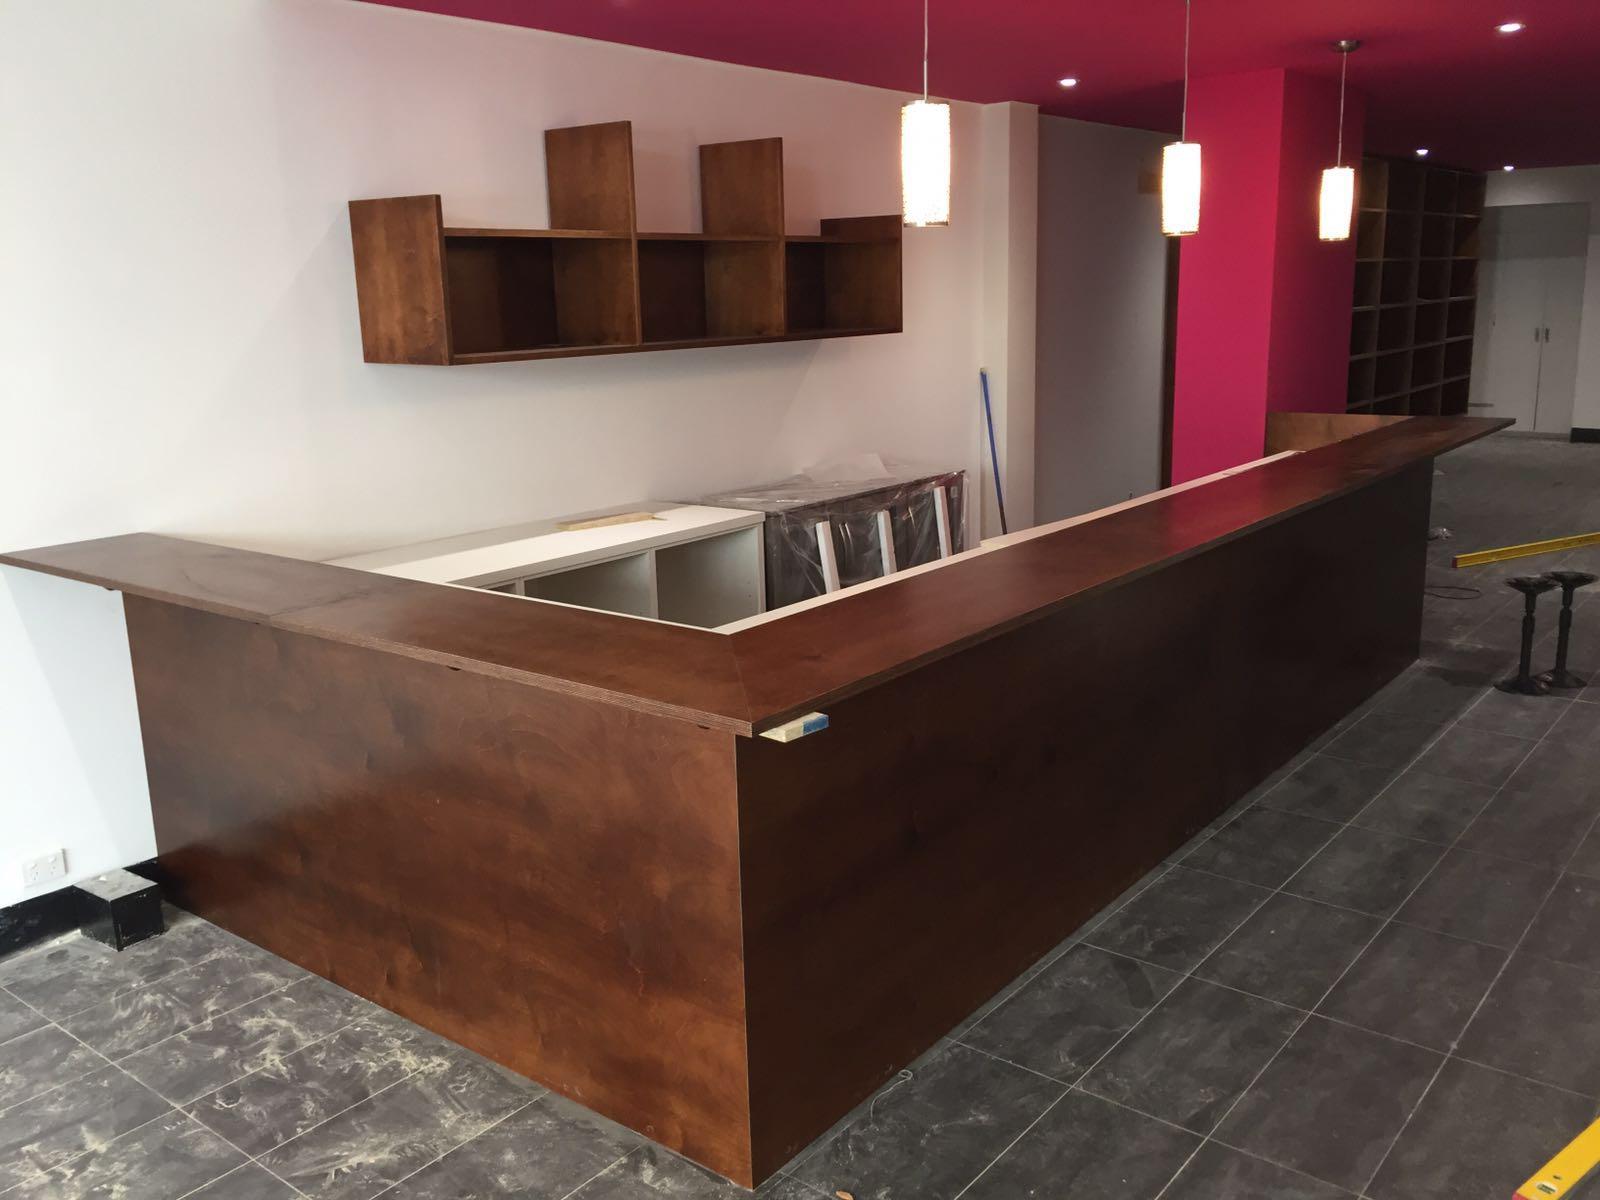 Maintenance Construction at Wine Bar Essendon|Ultimate Chippy